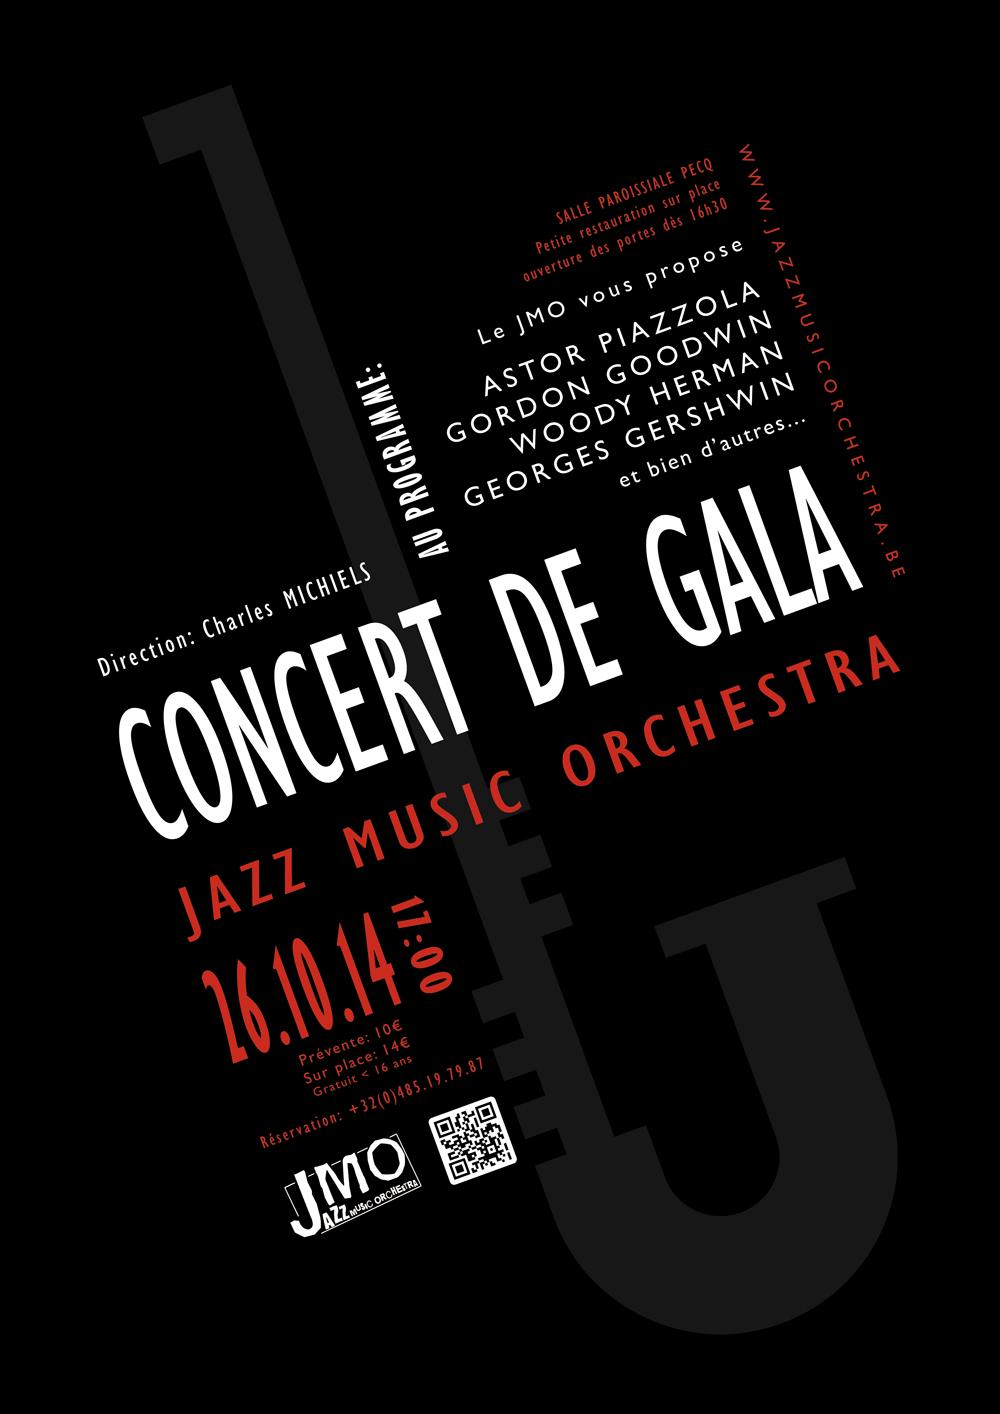 JMO-20141026-affiche